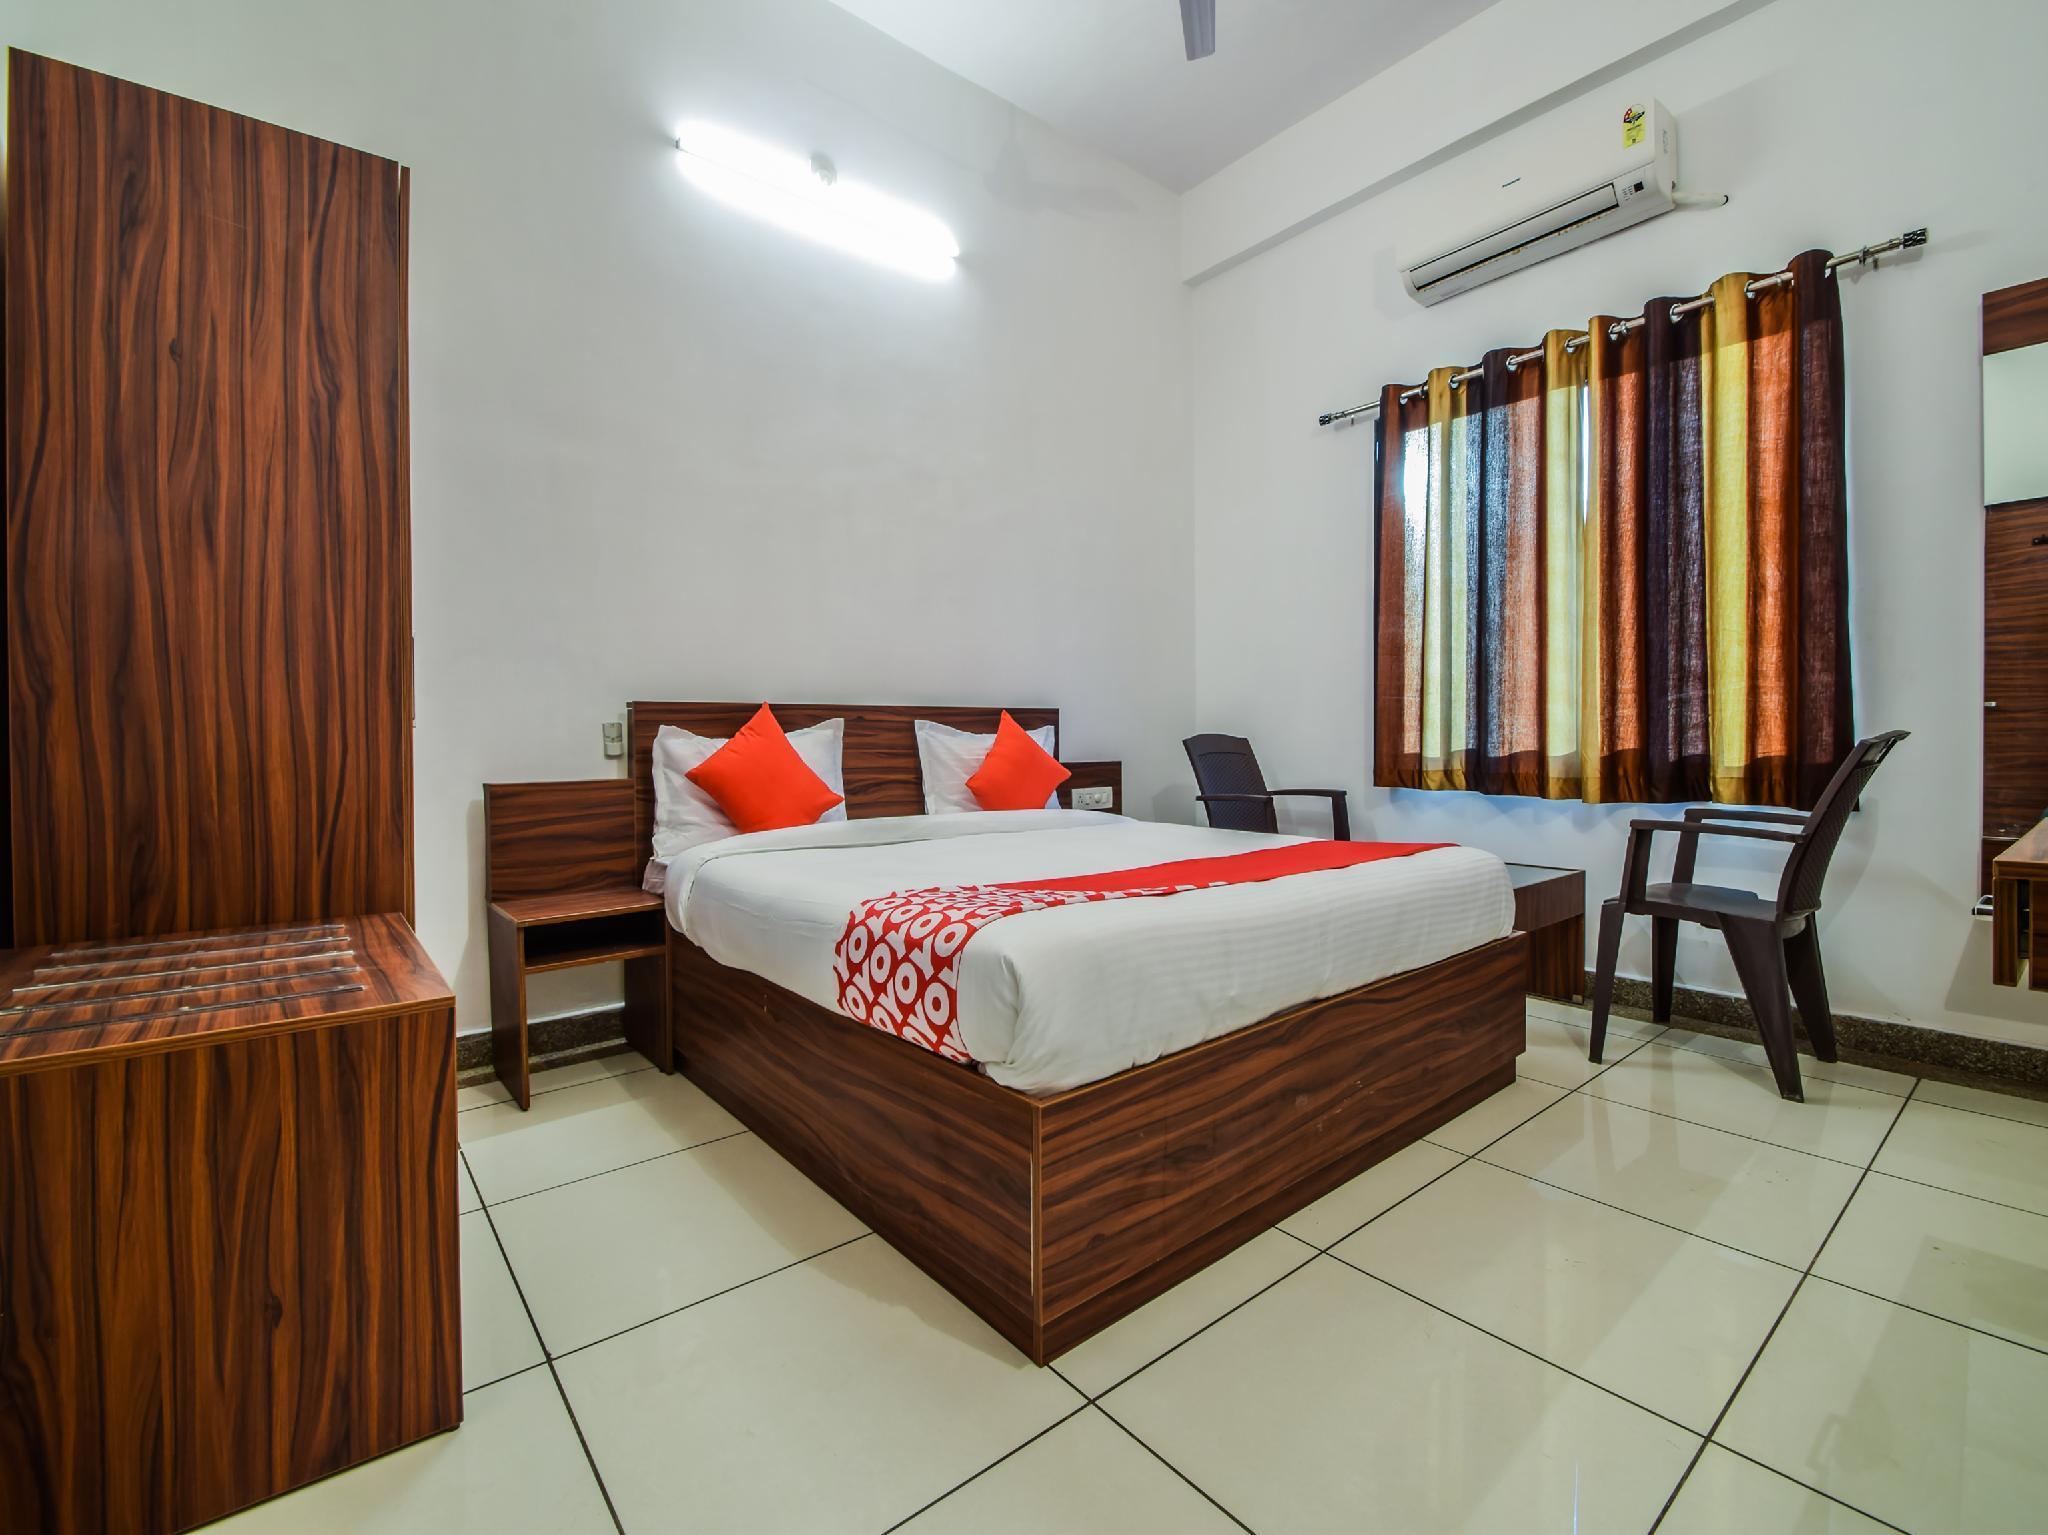 OYO 23381 Hotel Sagar Ratna